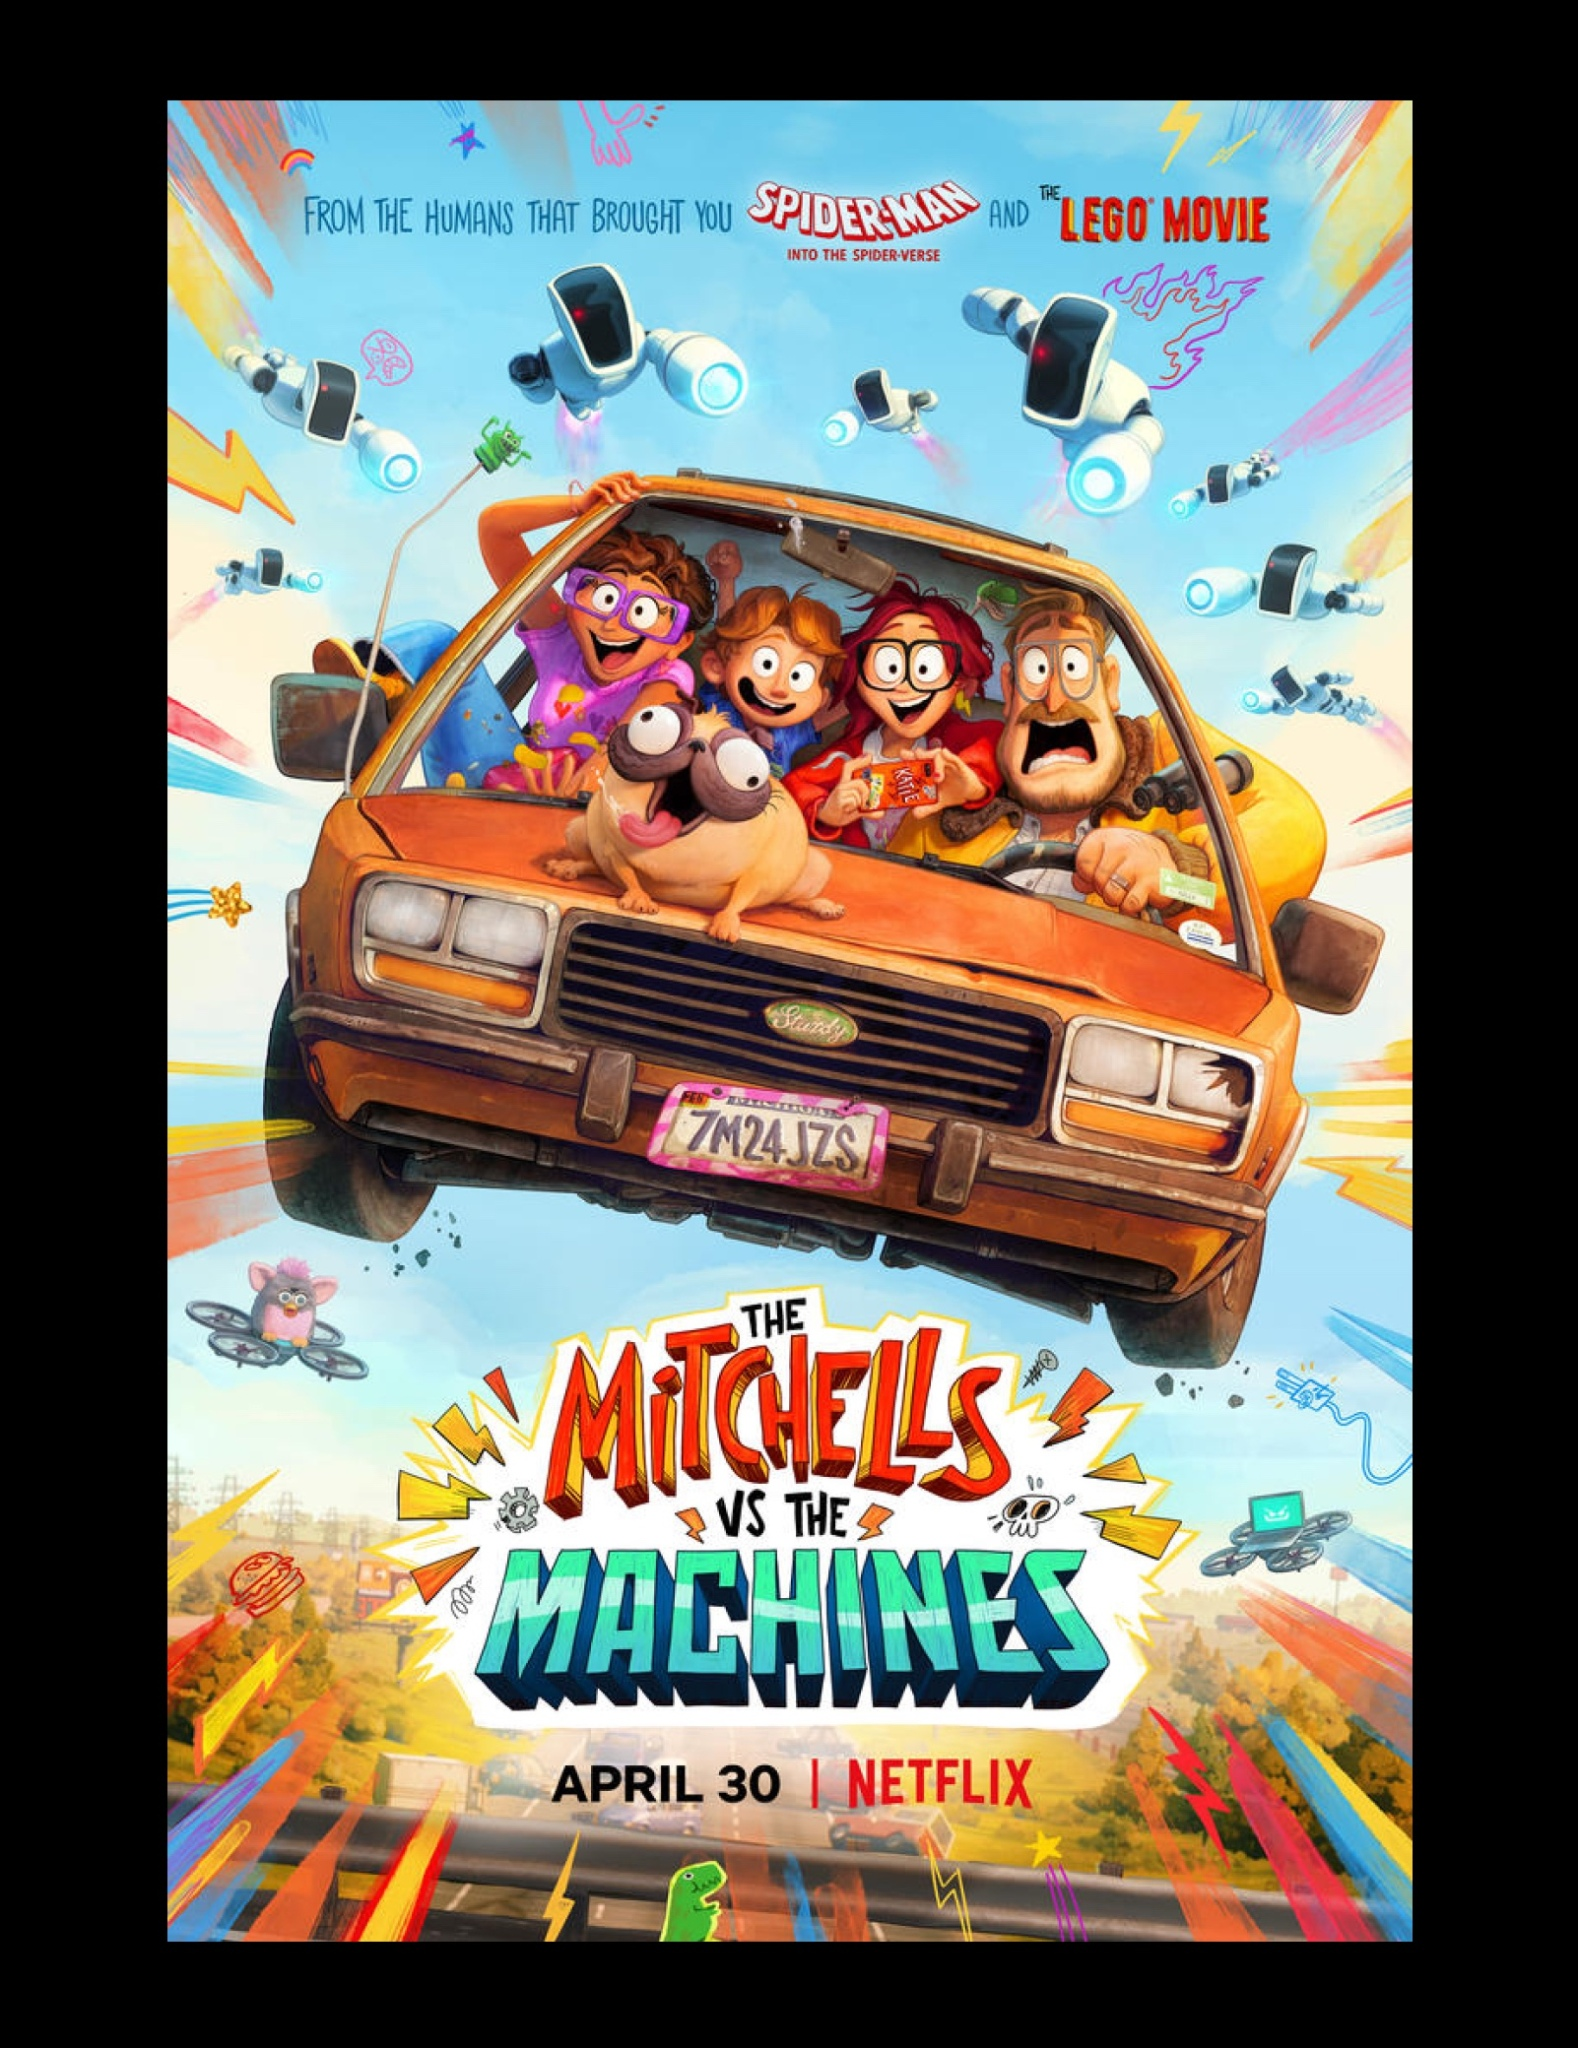 Watch The Mitchells vs The Machines April 30 on Netflix | LaptrinhX / News